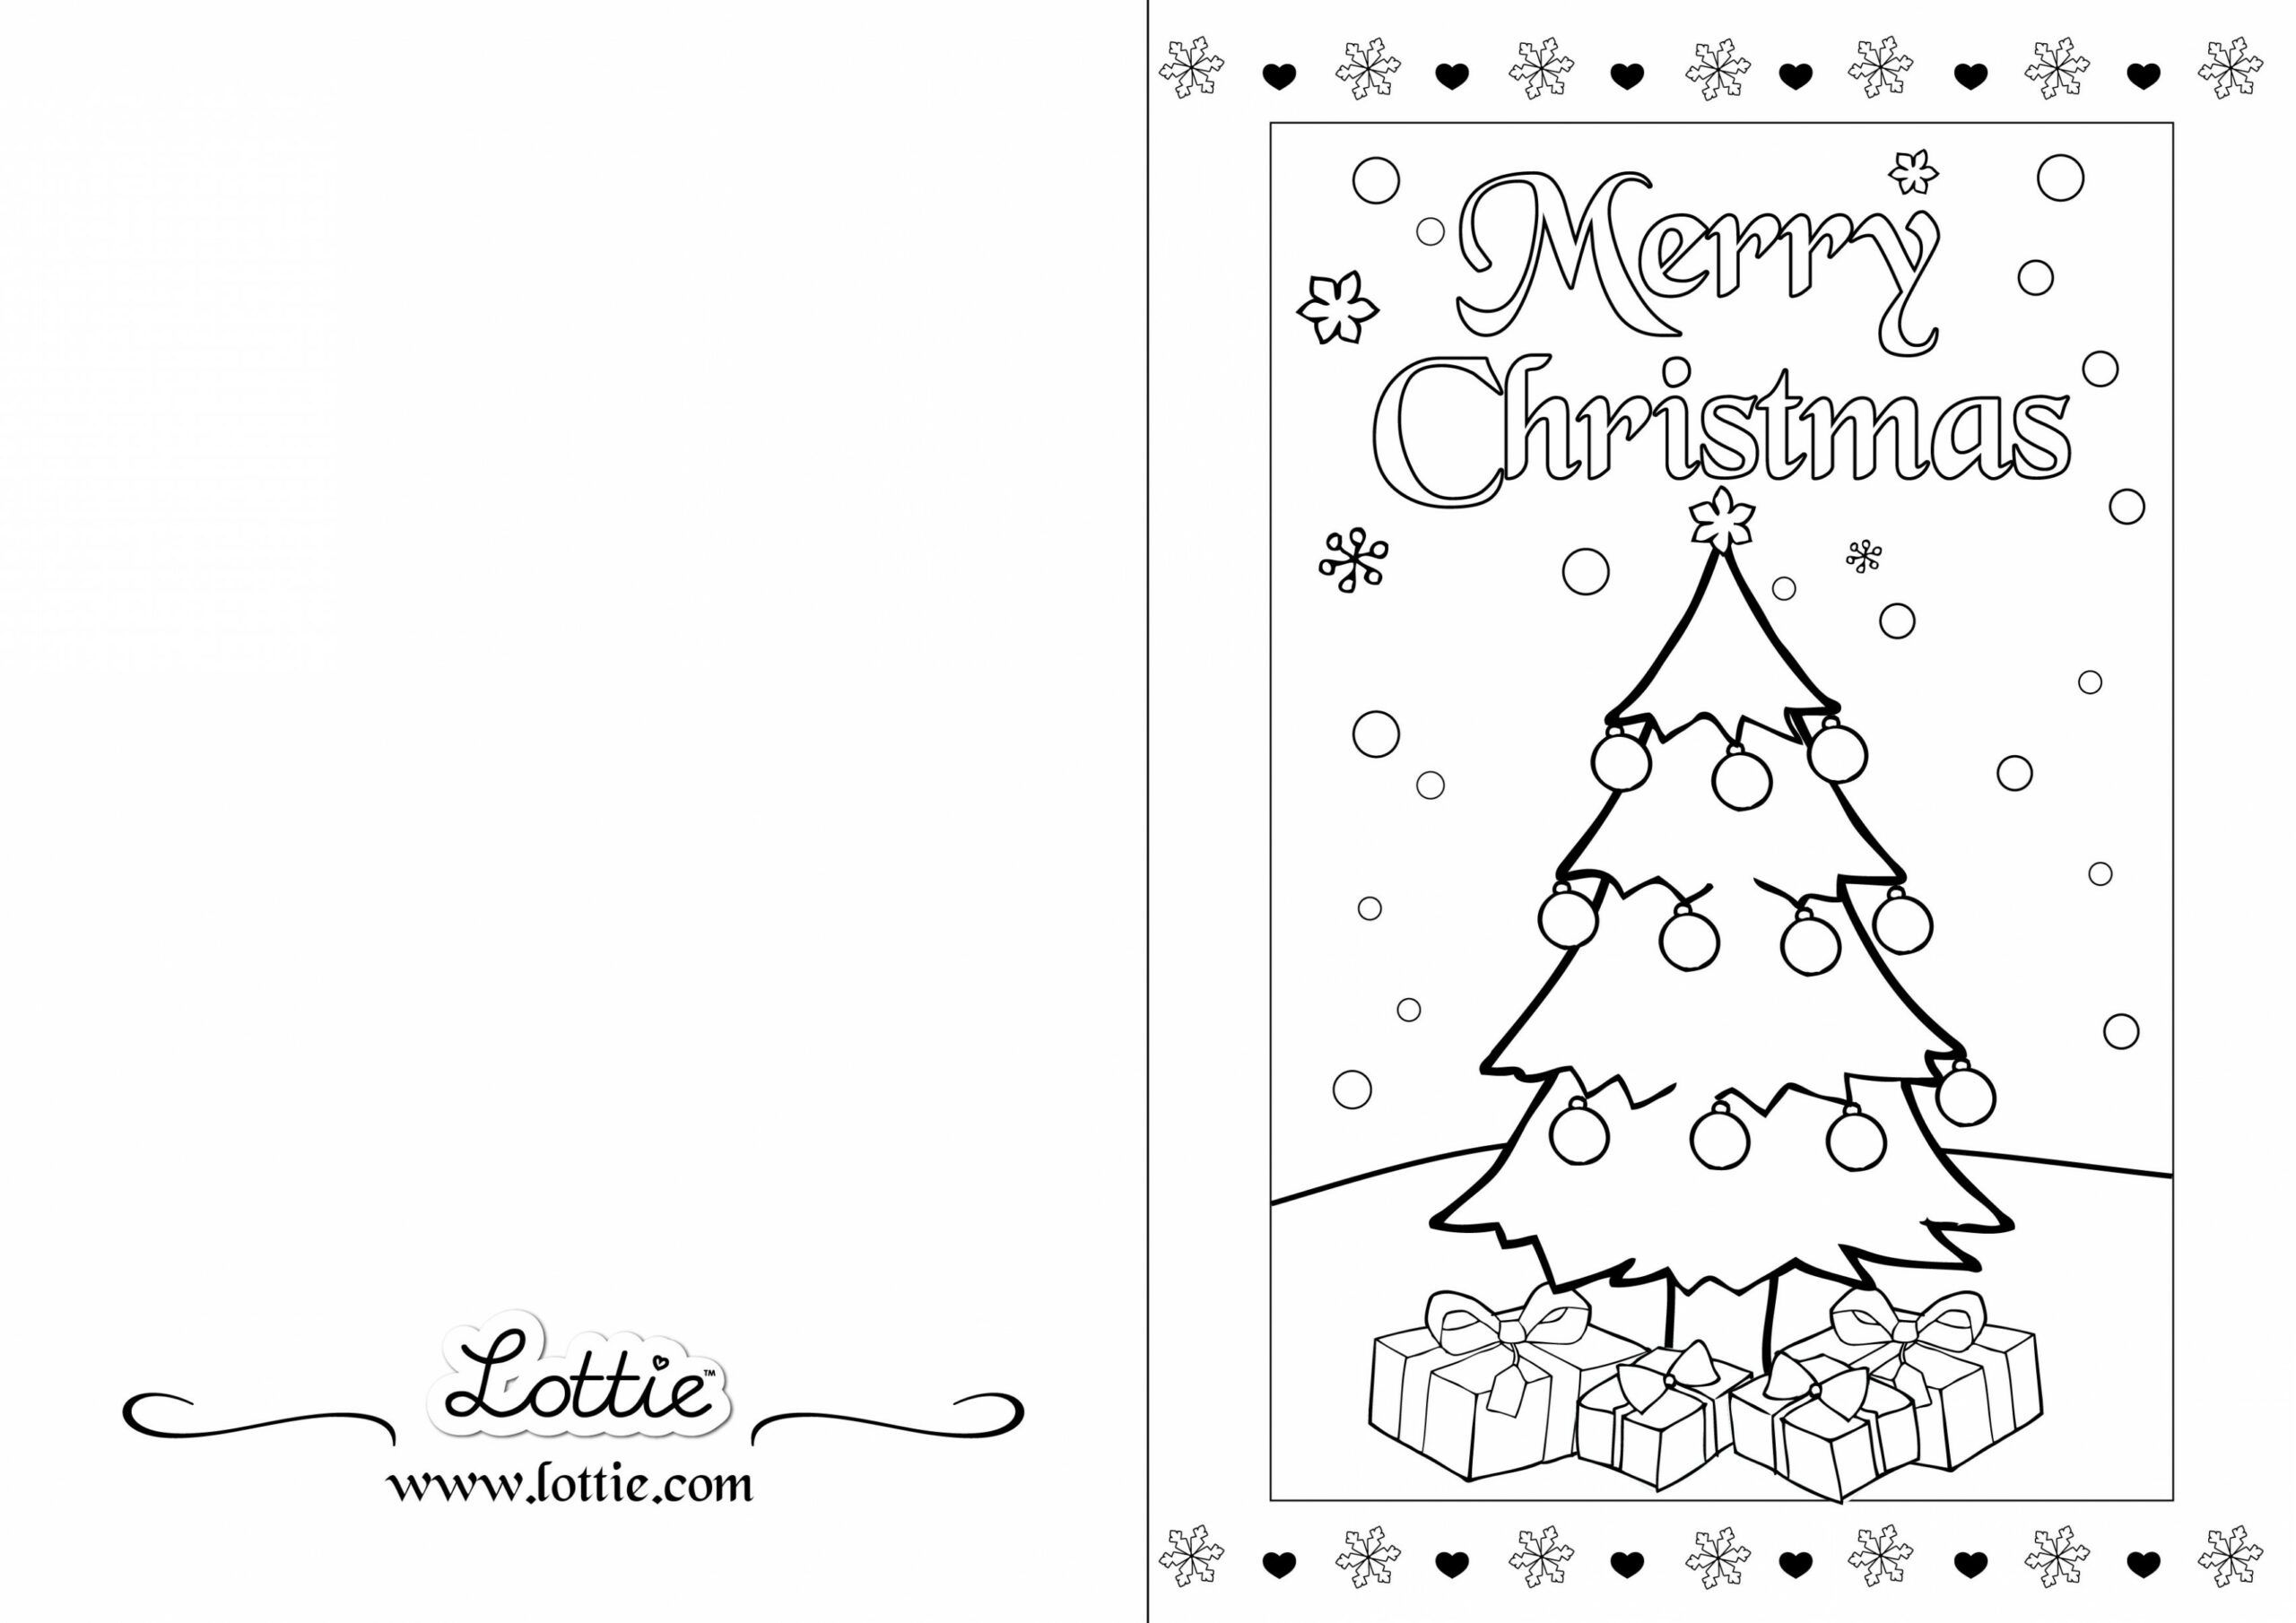 003 Unique Free Printable Religiou Christma Card Template Inspiration  TemplatesFull